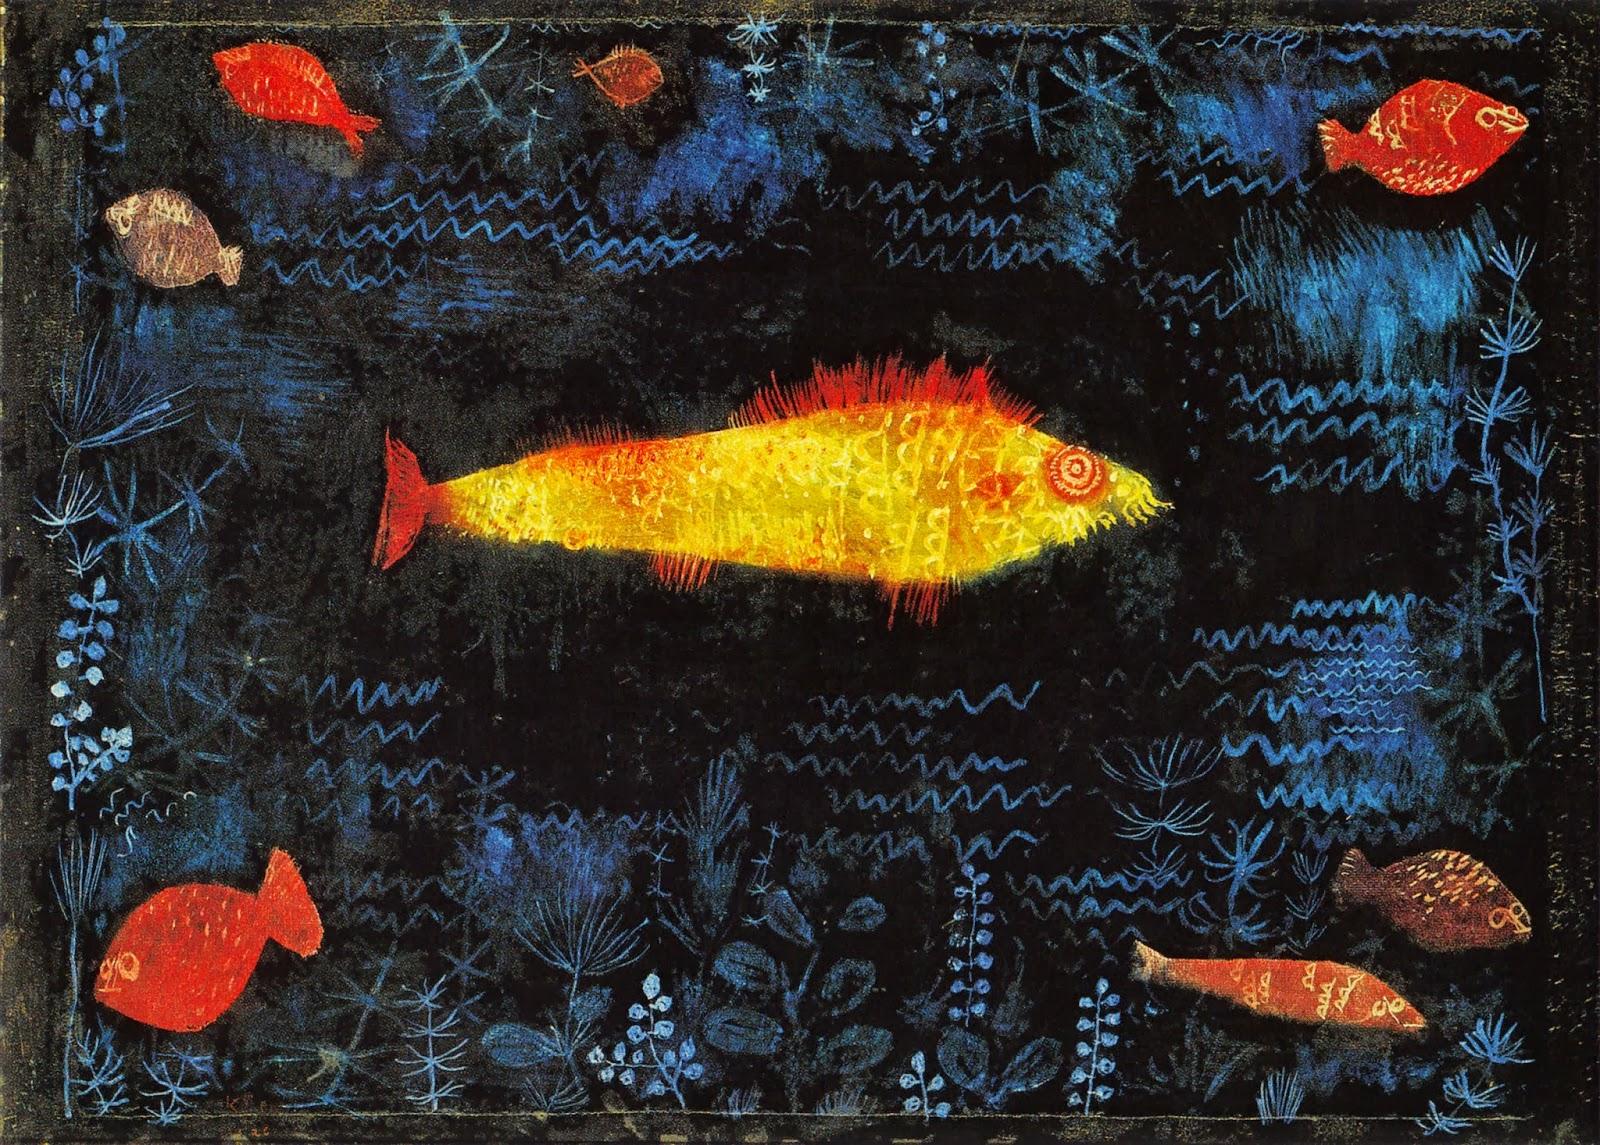 paul-klee-golden-fish.jpg